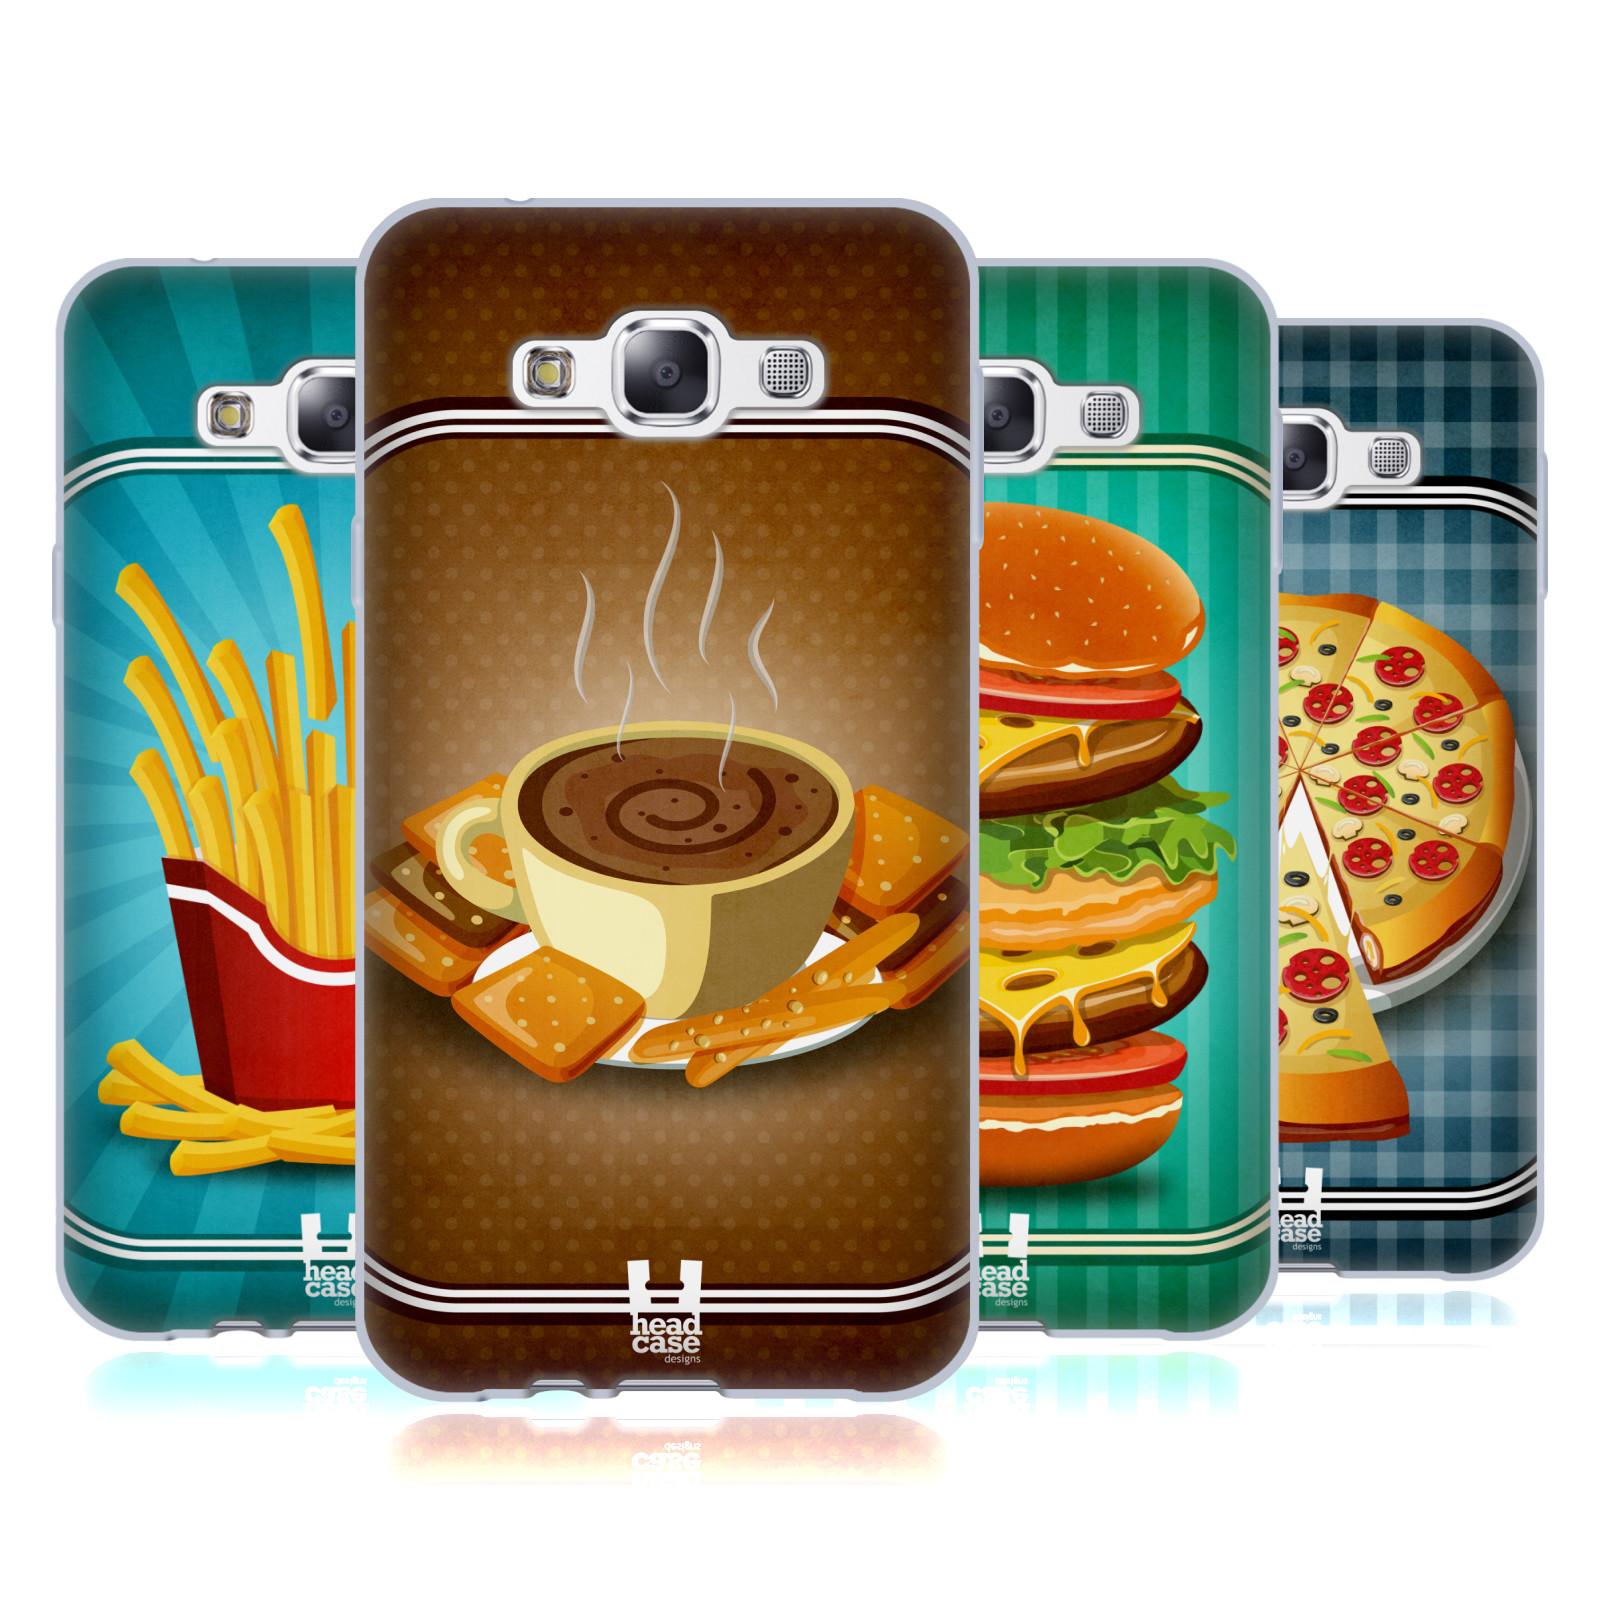 HEAD-CASE-DESIGNS-VINTAGE-TREATS-SOFT-GEL-CASE-FOR-SAMSUNG-PHONES-3